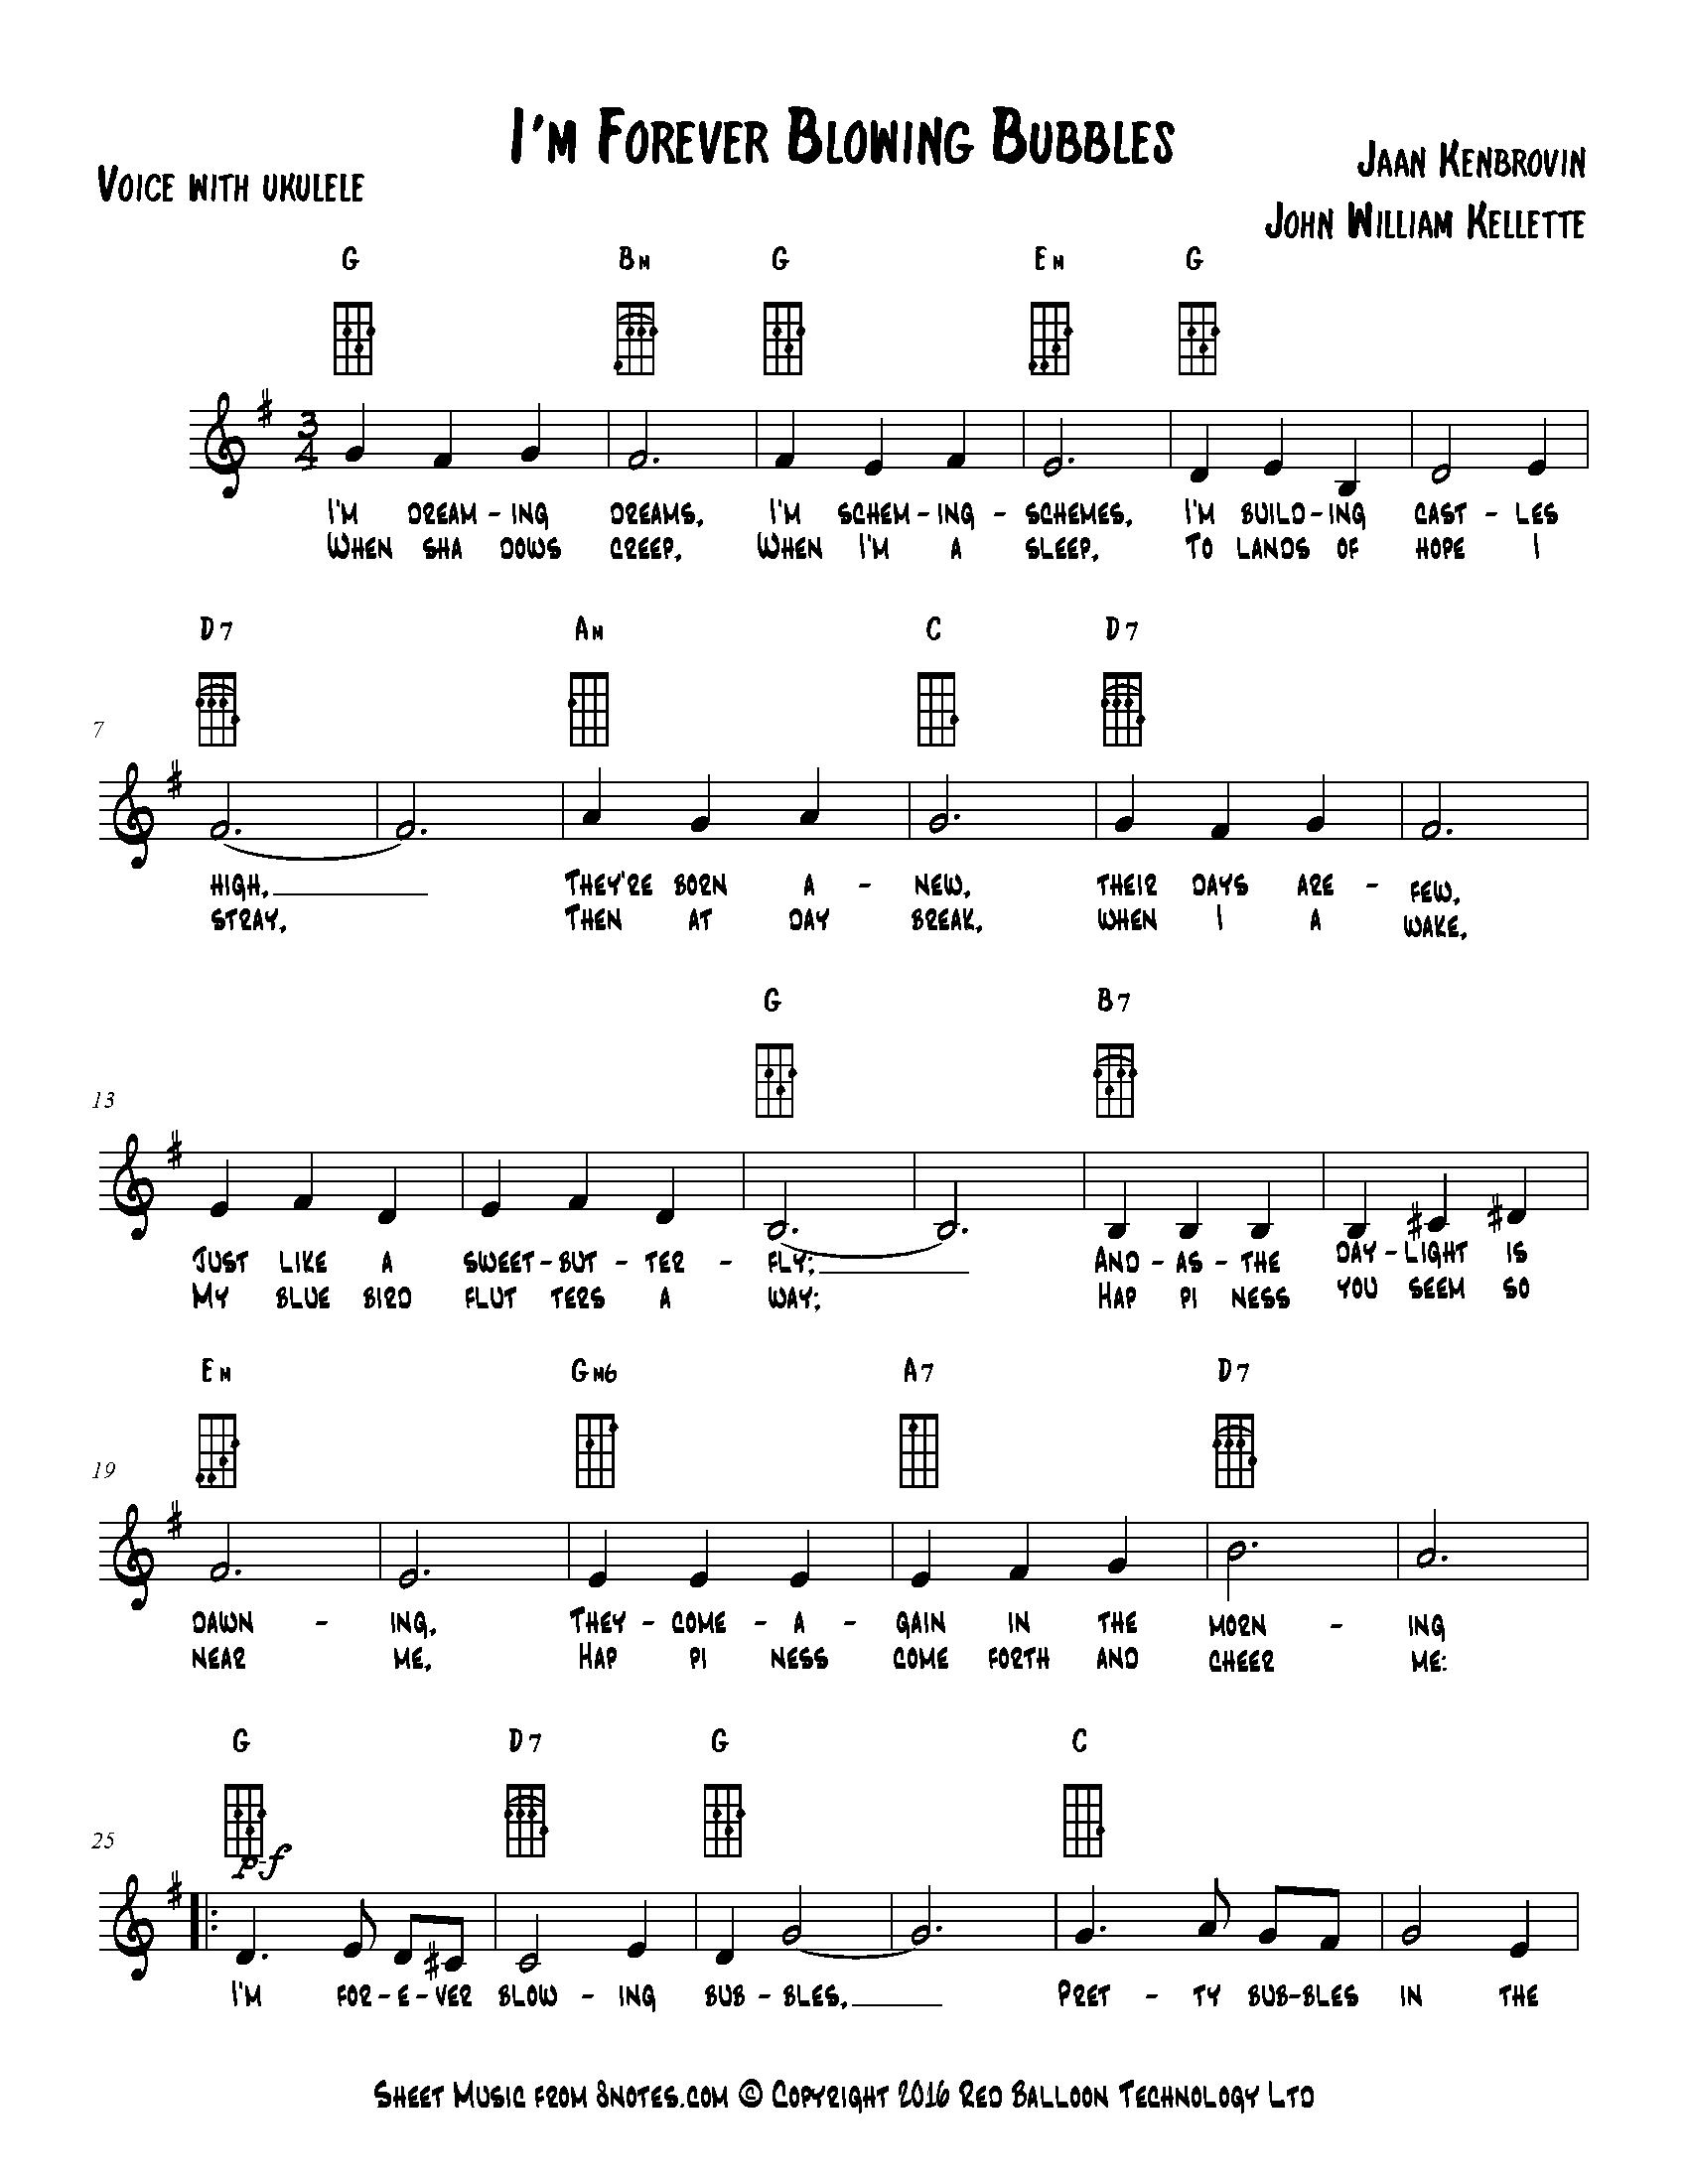 john william kellette - i'm forever blowing bubbles sheet music for ukulele lead  sheets - 8notes.com  8notes